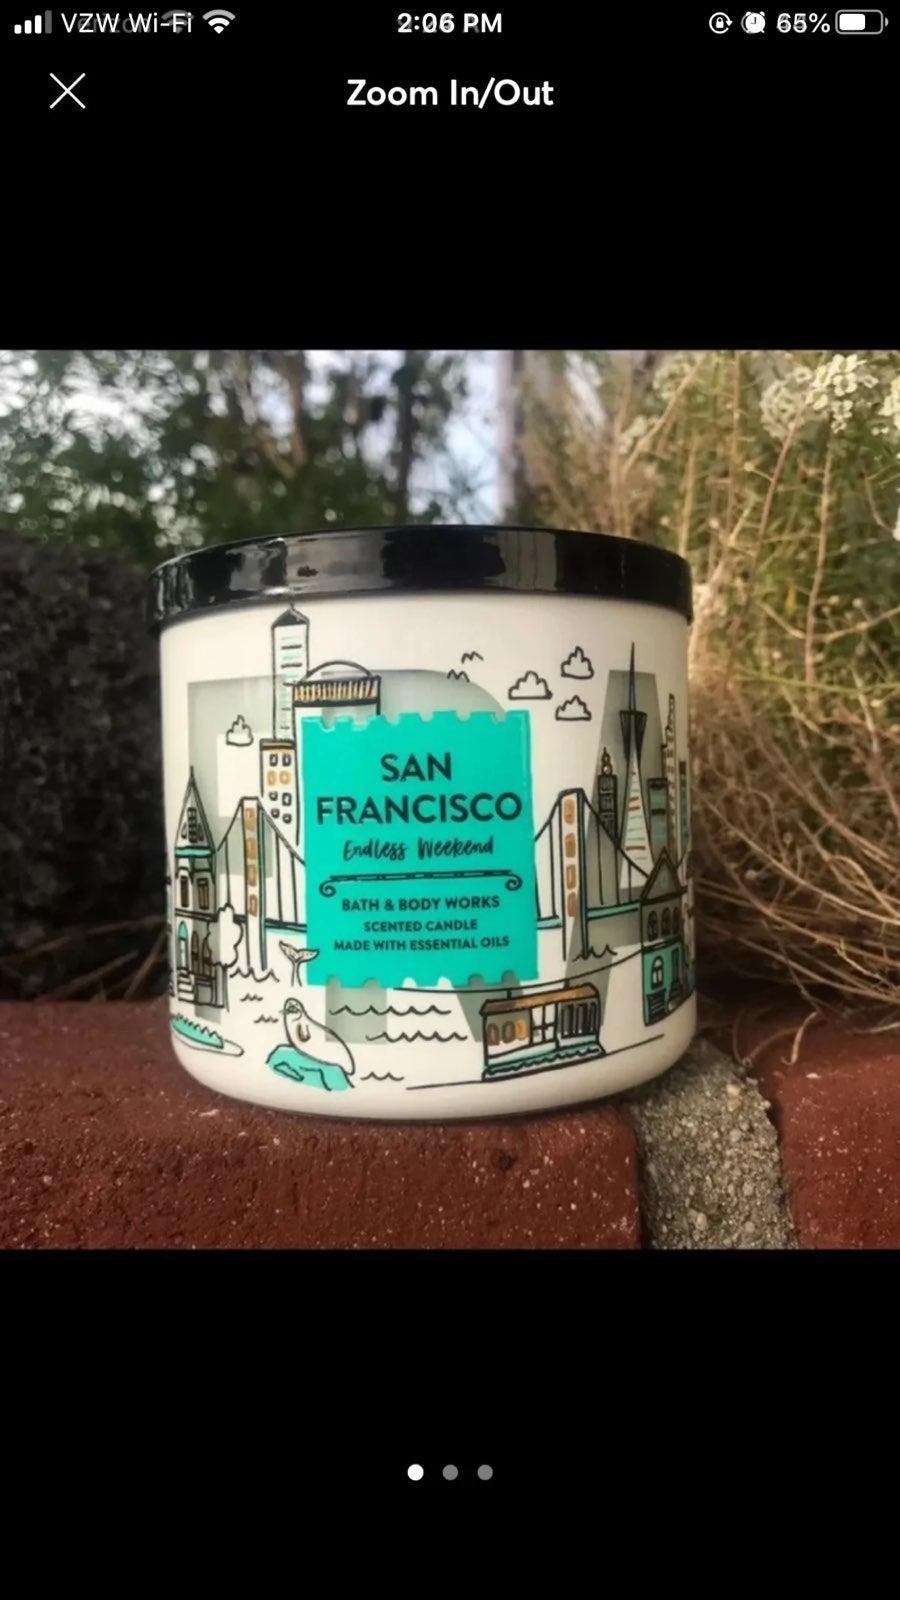 mercari.com - San francisco candle bath body works